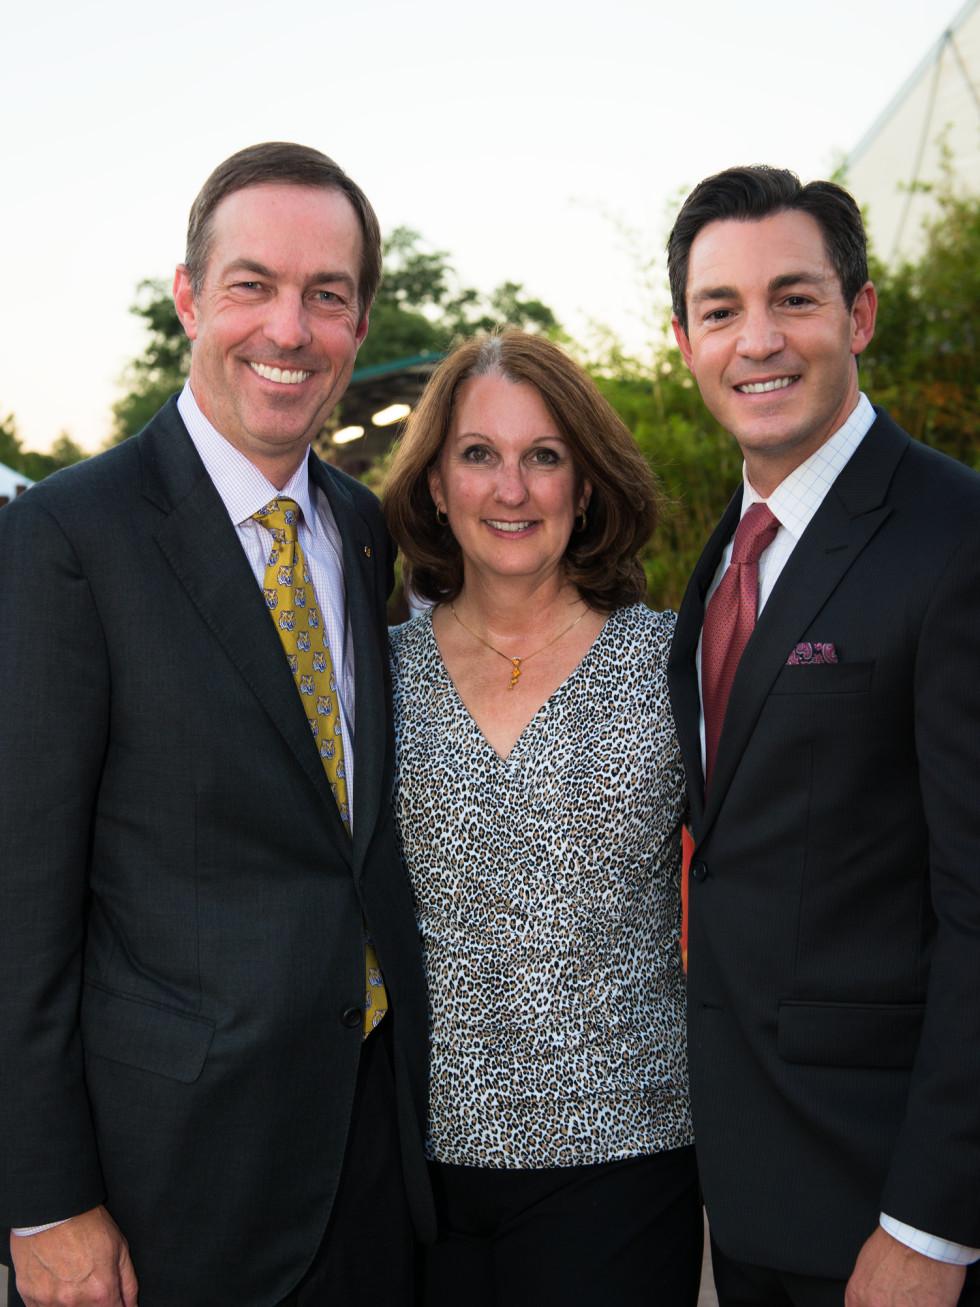 Houston Zoo Conservation Gala 2015 Bruce Niemeyer, Cathy Niemeyer, Andy Cerota